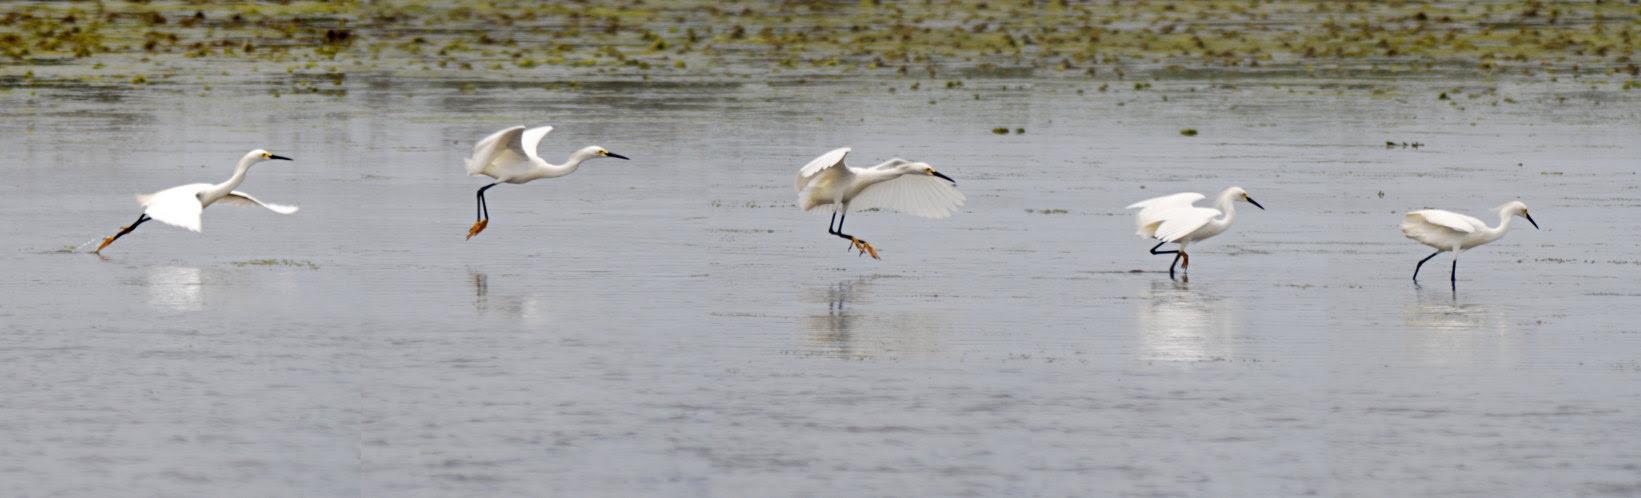 「egrets」的圖片搜尋結果